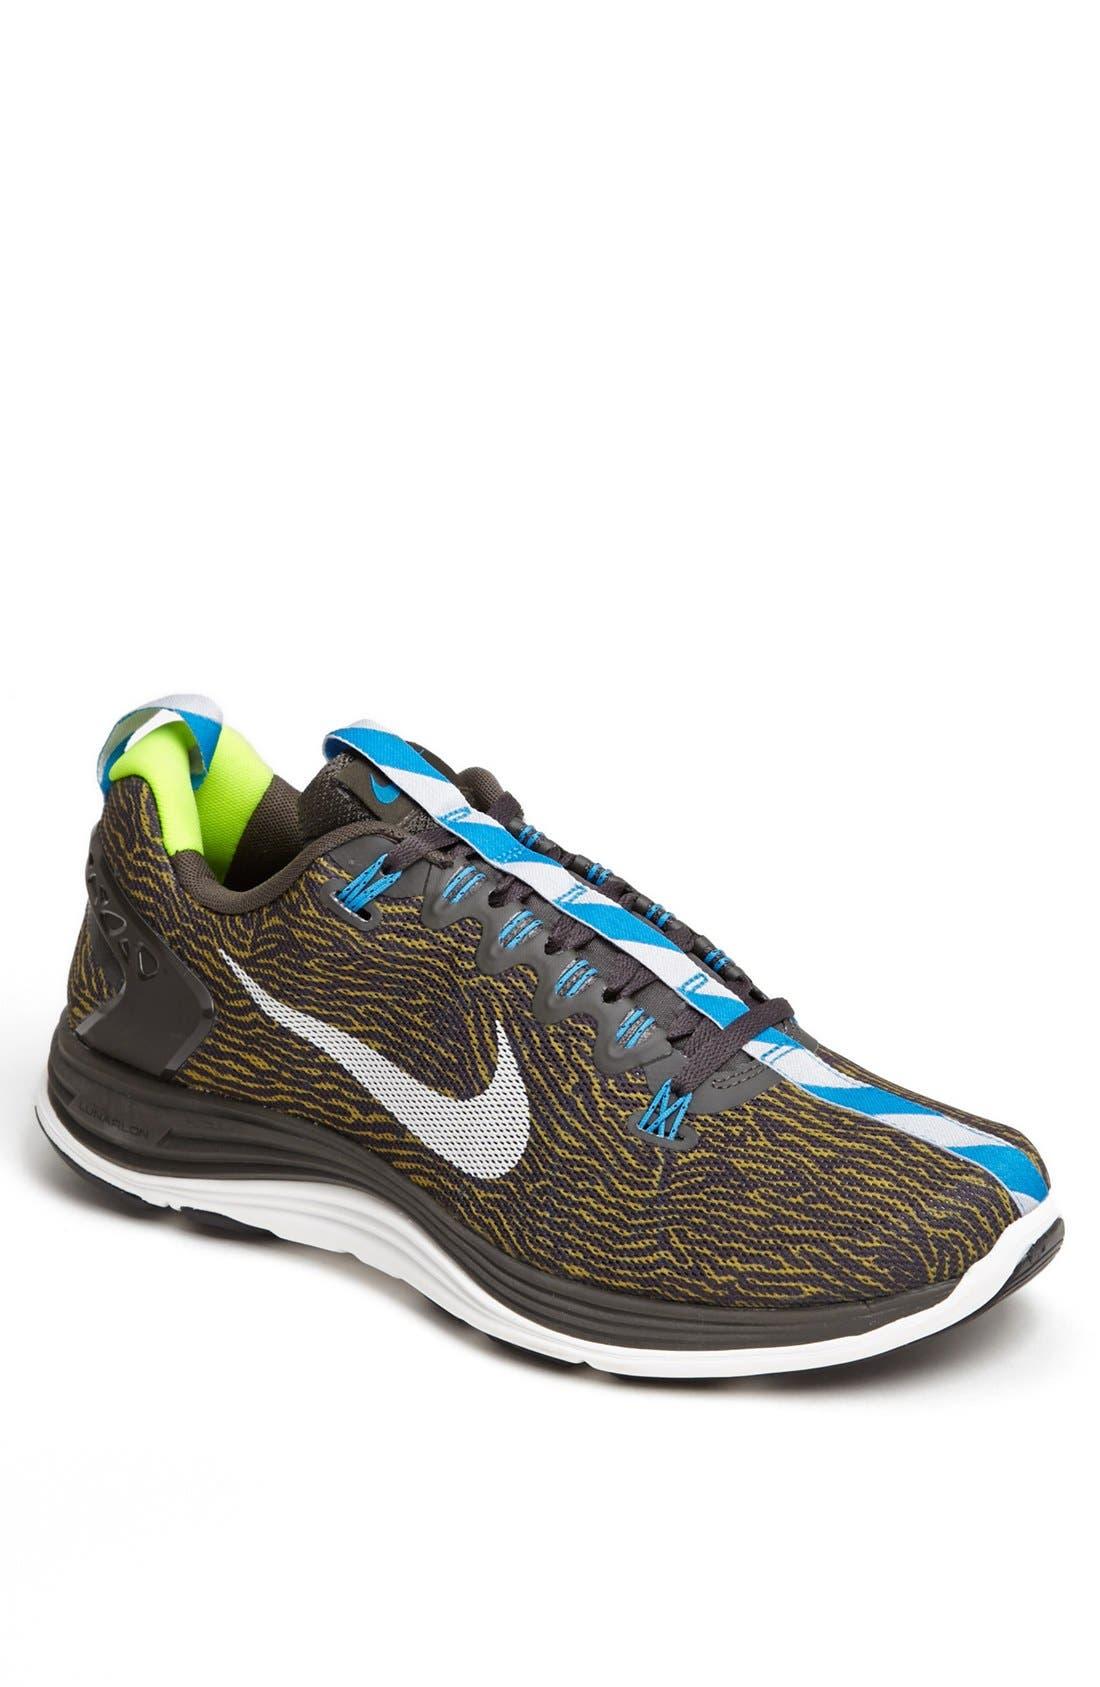 Alternate Image 1 Selected - Nike 'LunarGlide+ 5 EXT Premium' Training Shoe